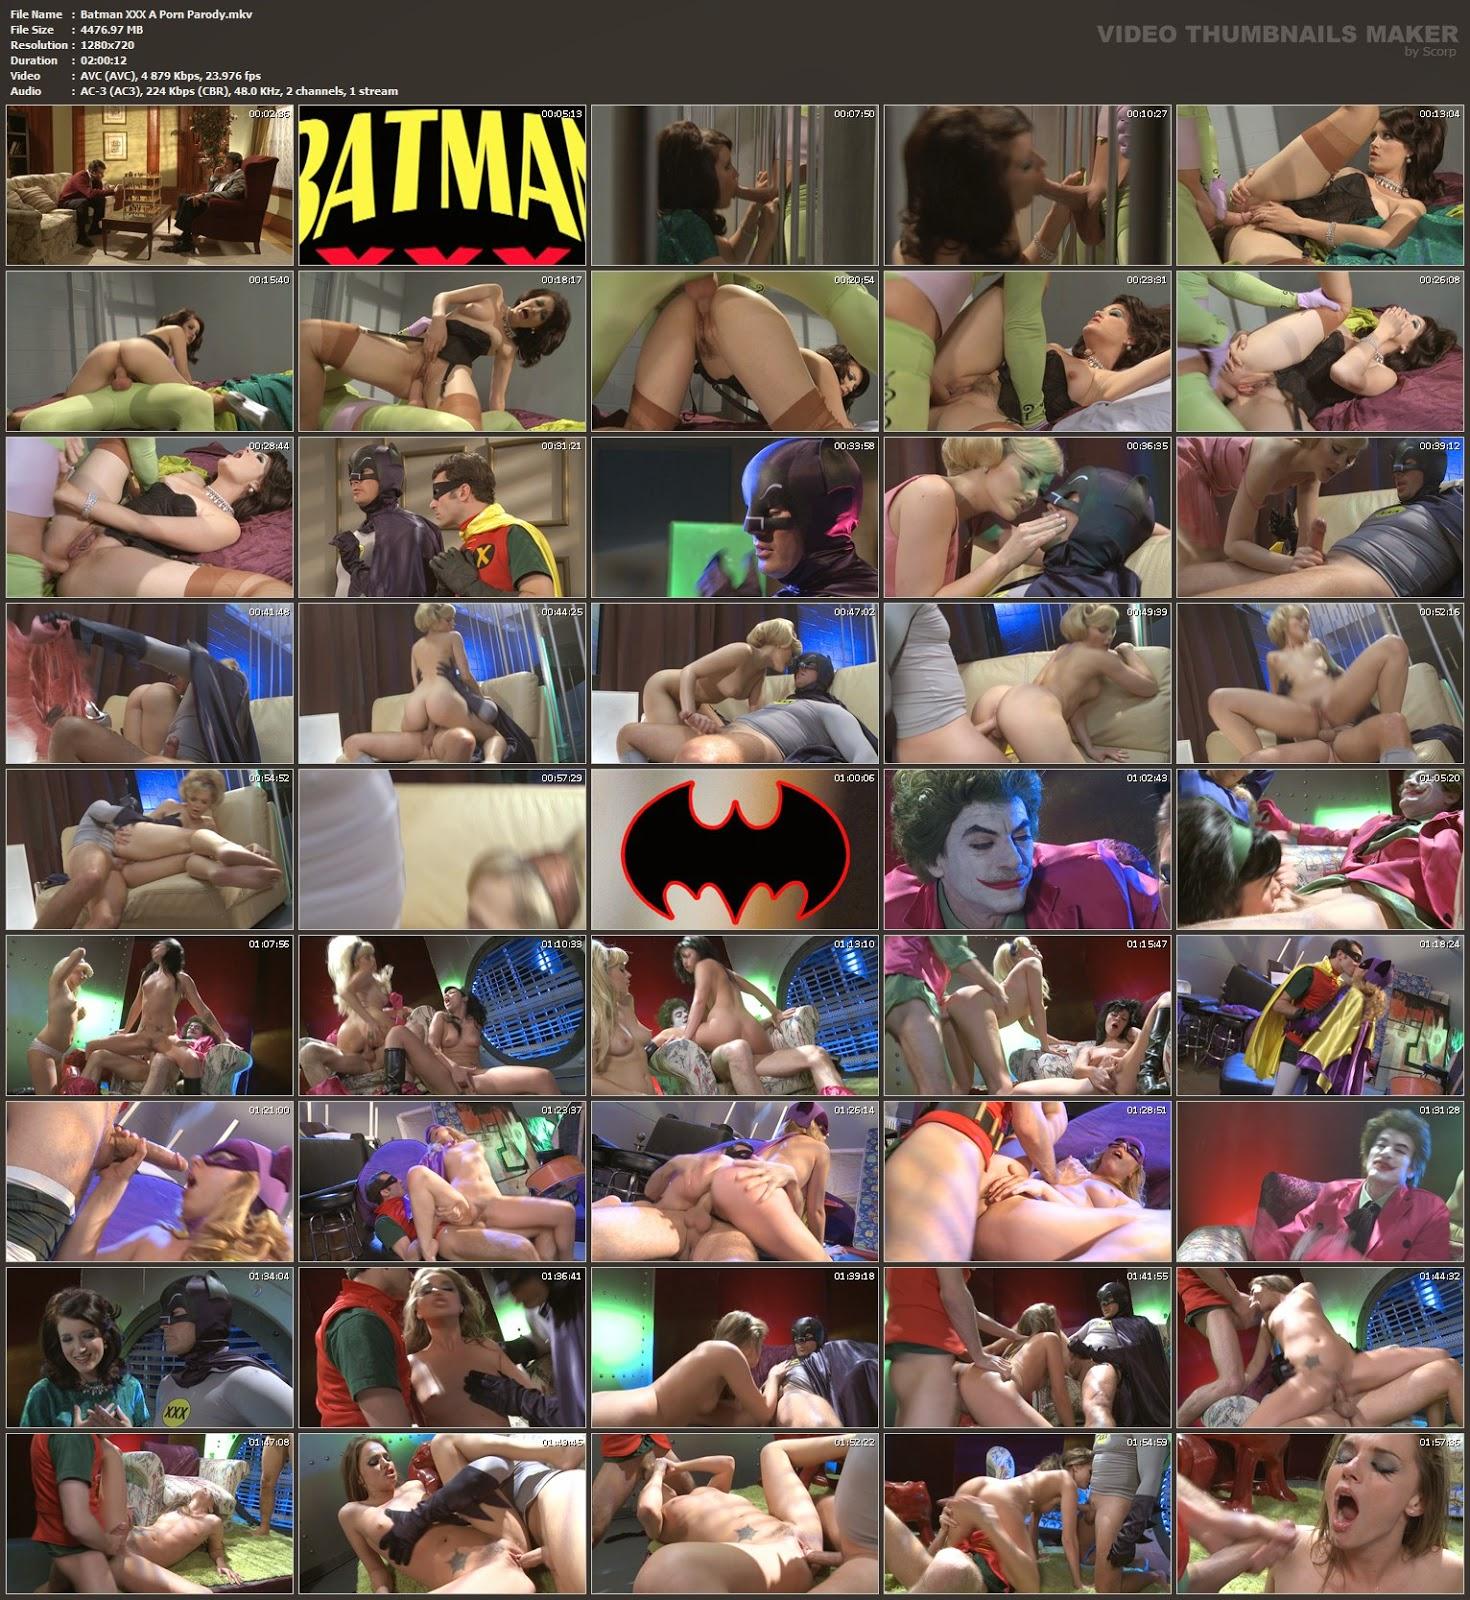 Batman xxx a porn parody  бэтман xхх пародия 2010